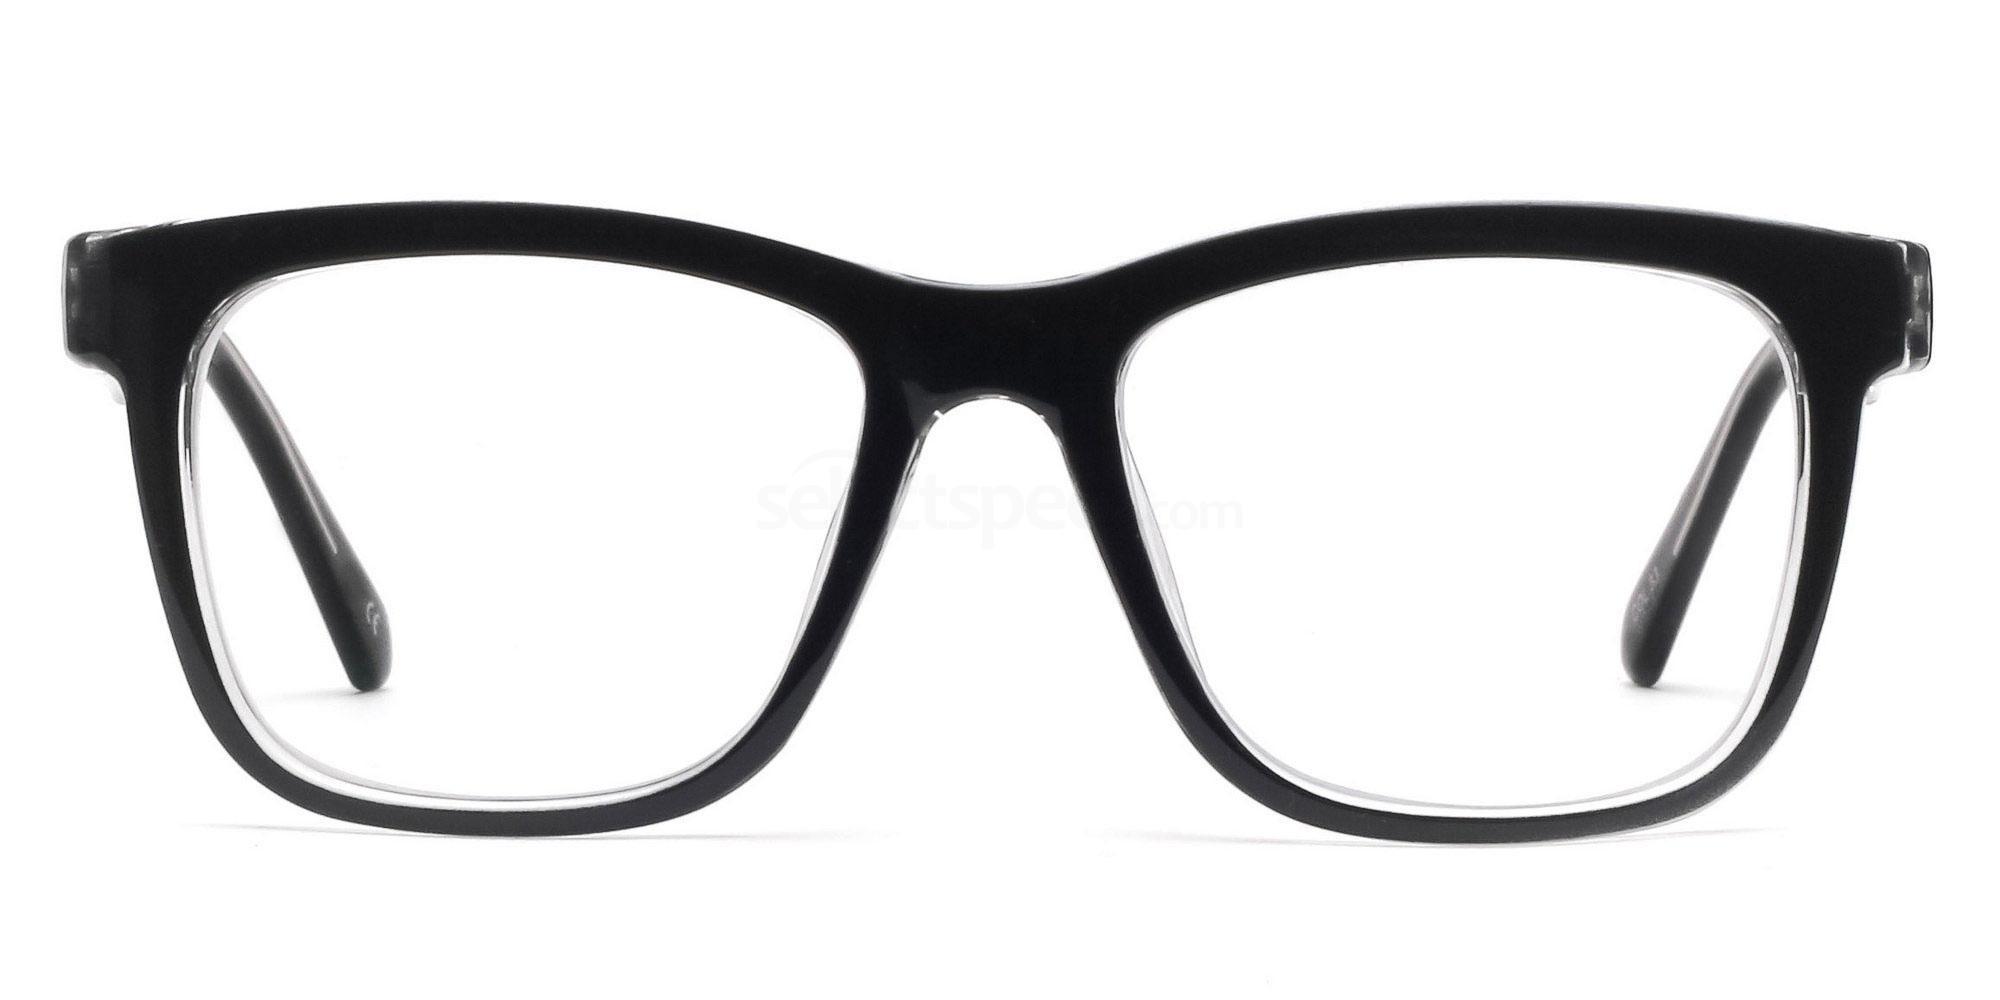 C33 2444 - Black and Clear Glasses, Savannah